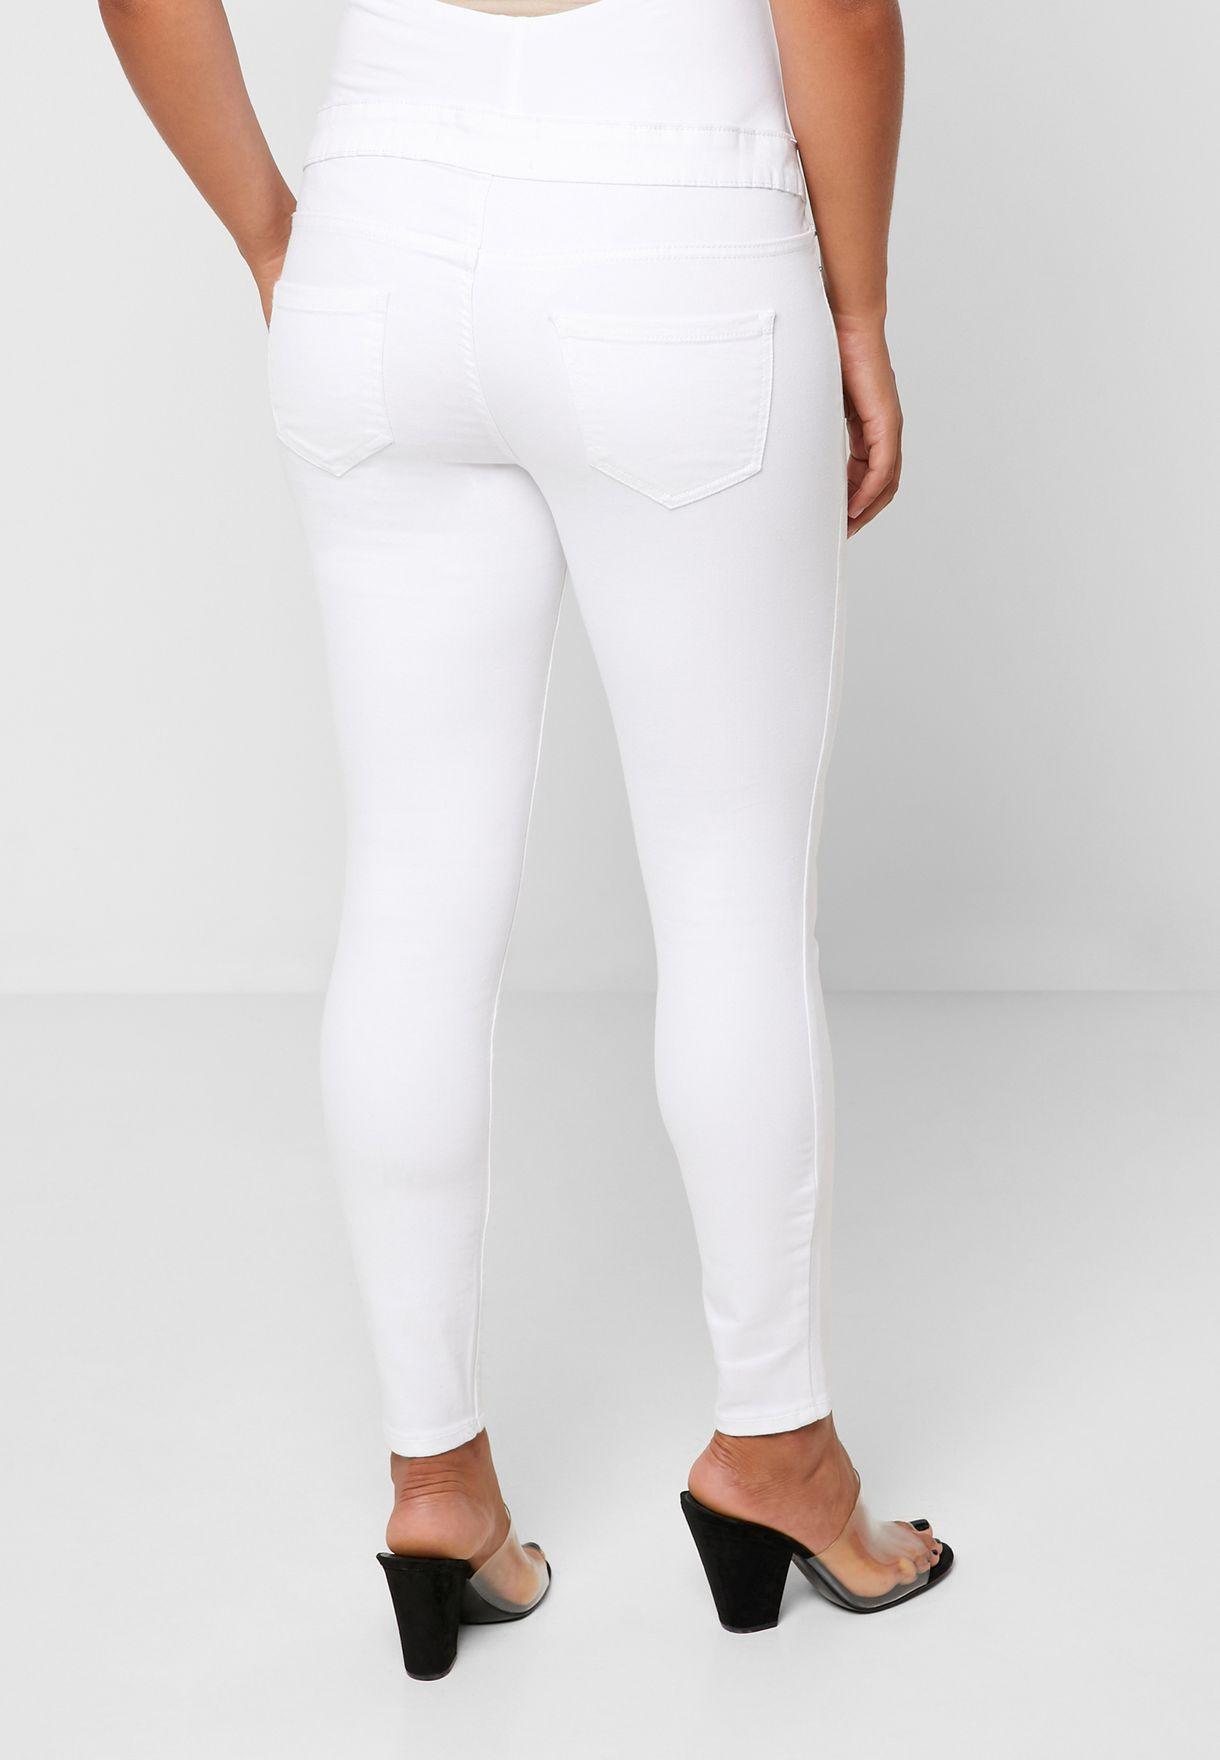 Ankle Grazer Jeans